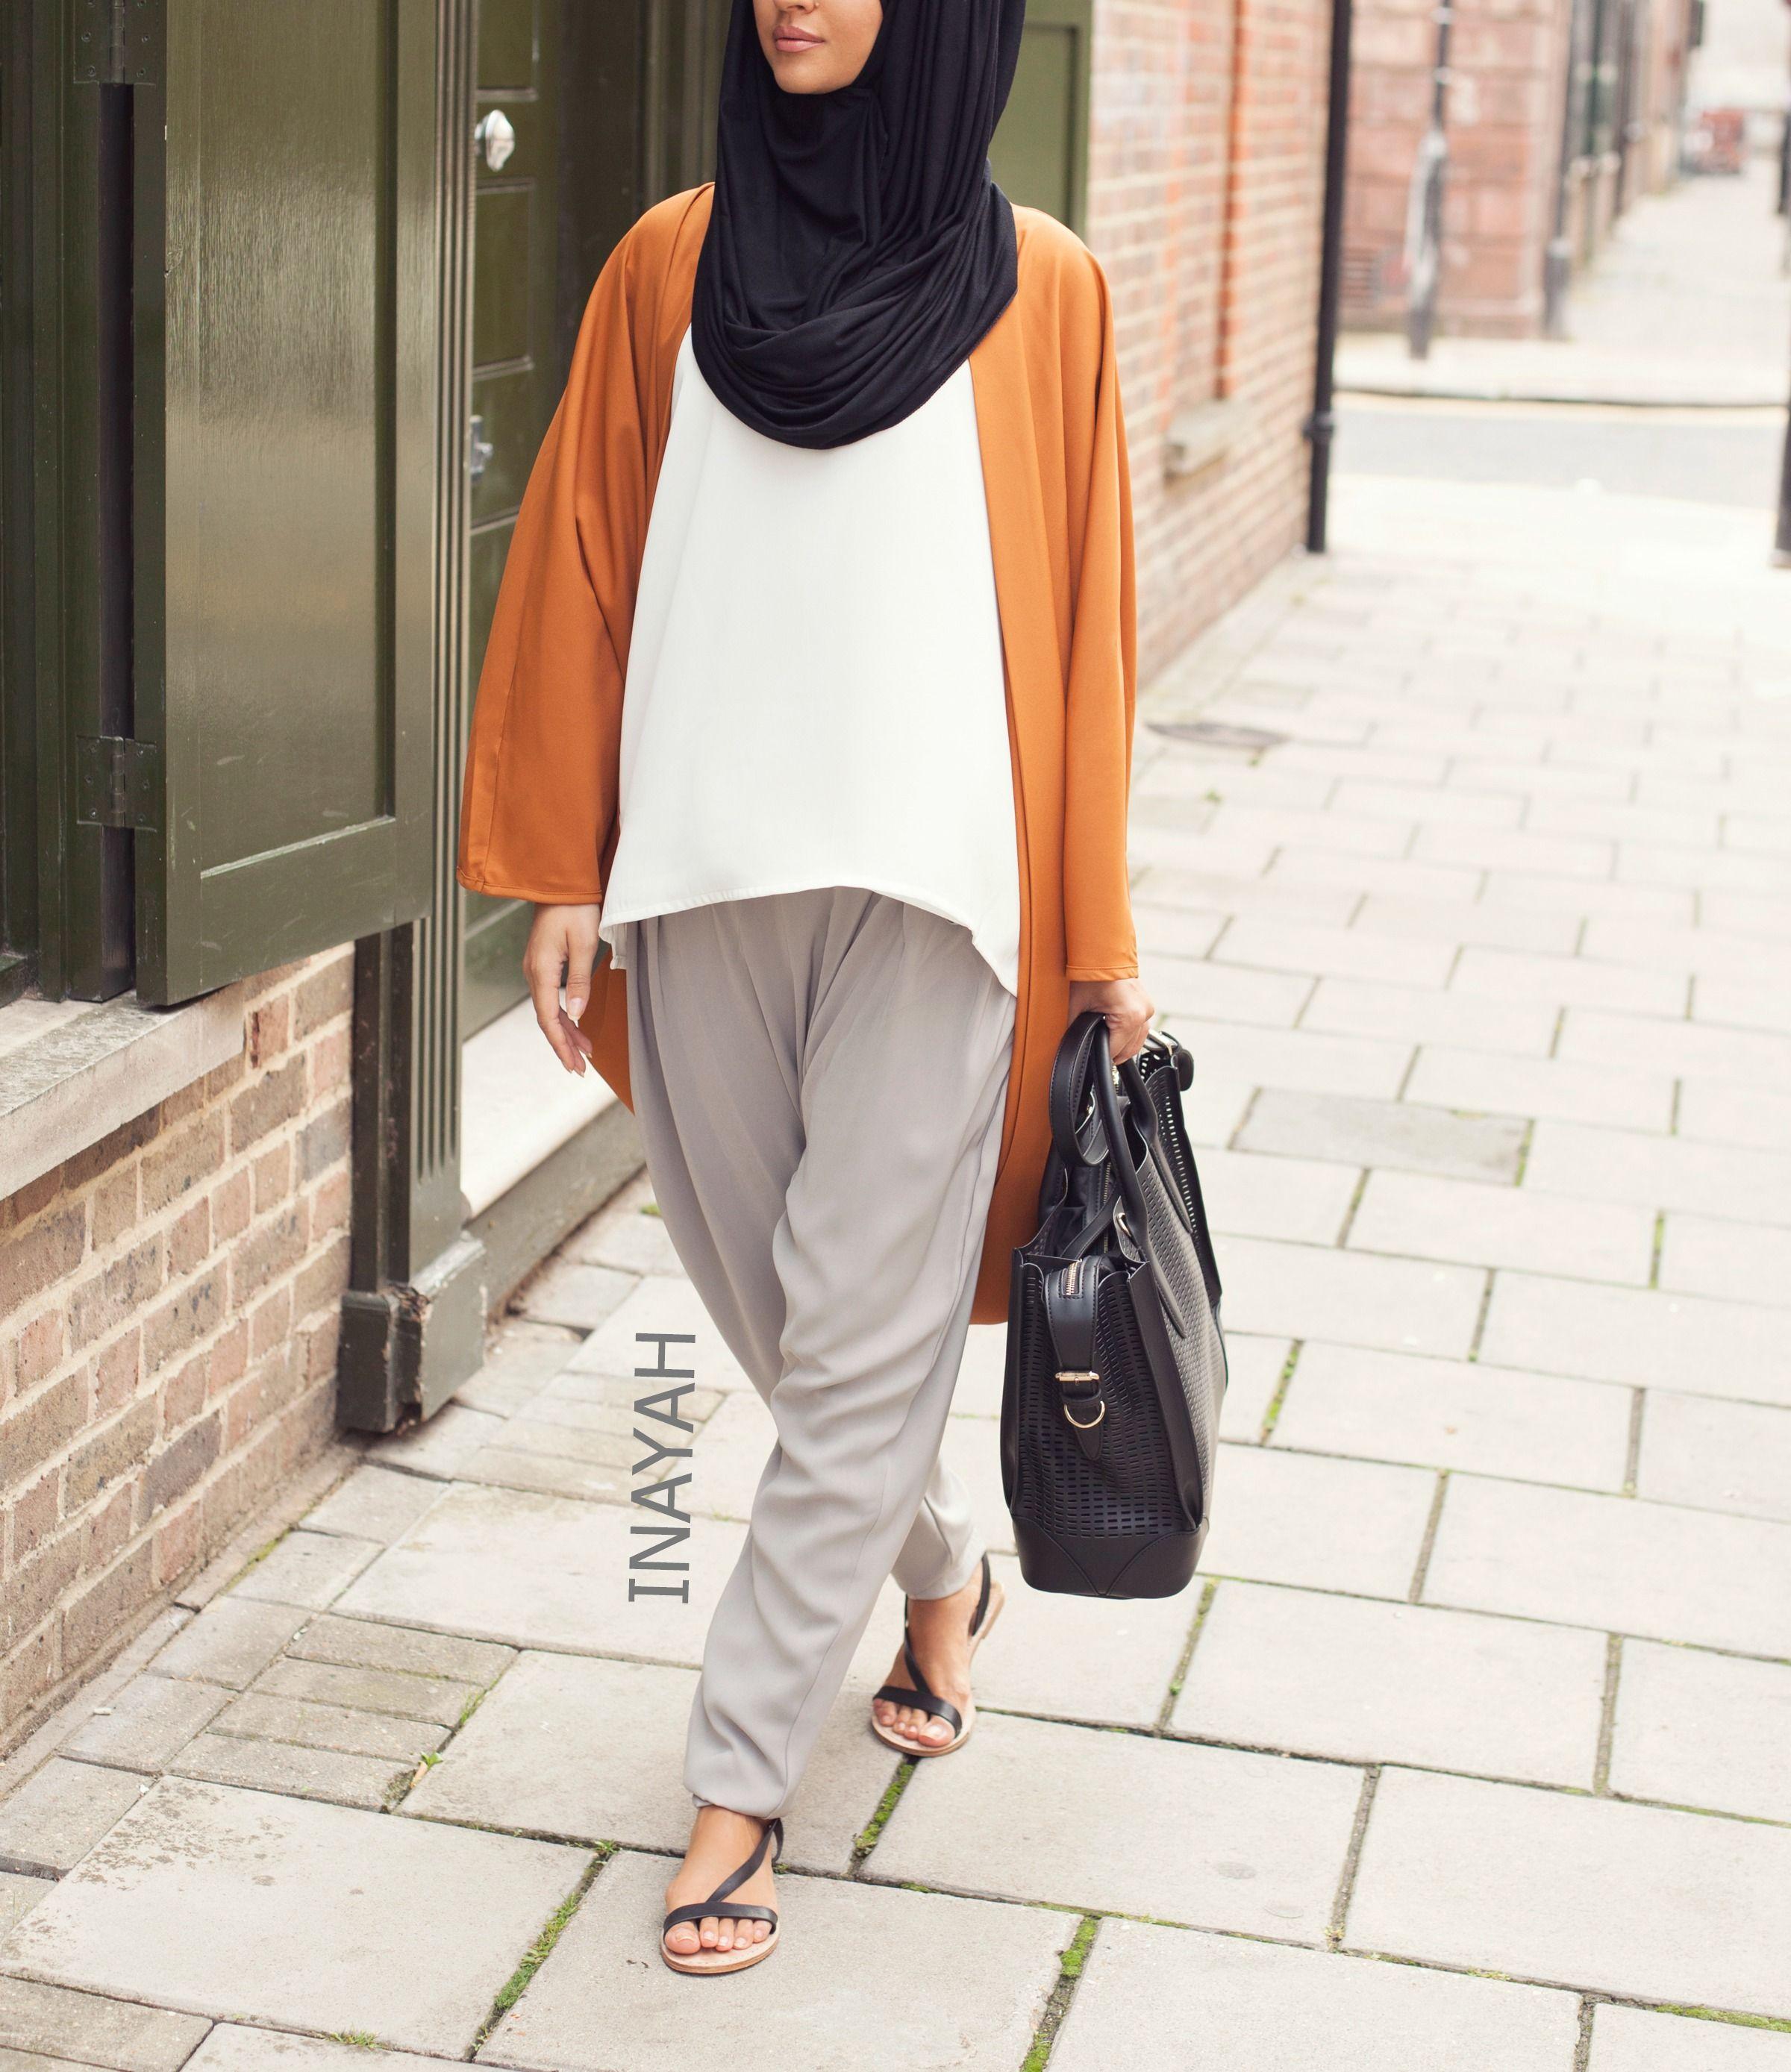 Tan Cocoon Cardigan  + Grey Crossover Trousers + Black Maxi Jersey Hijab  | INAYAH www.inayahcollection.com  #inayah#hijabfashion#modestfashion#modeststreetfashion